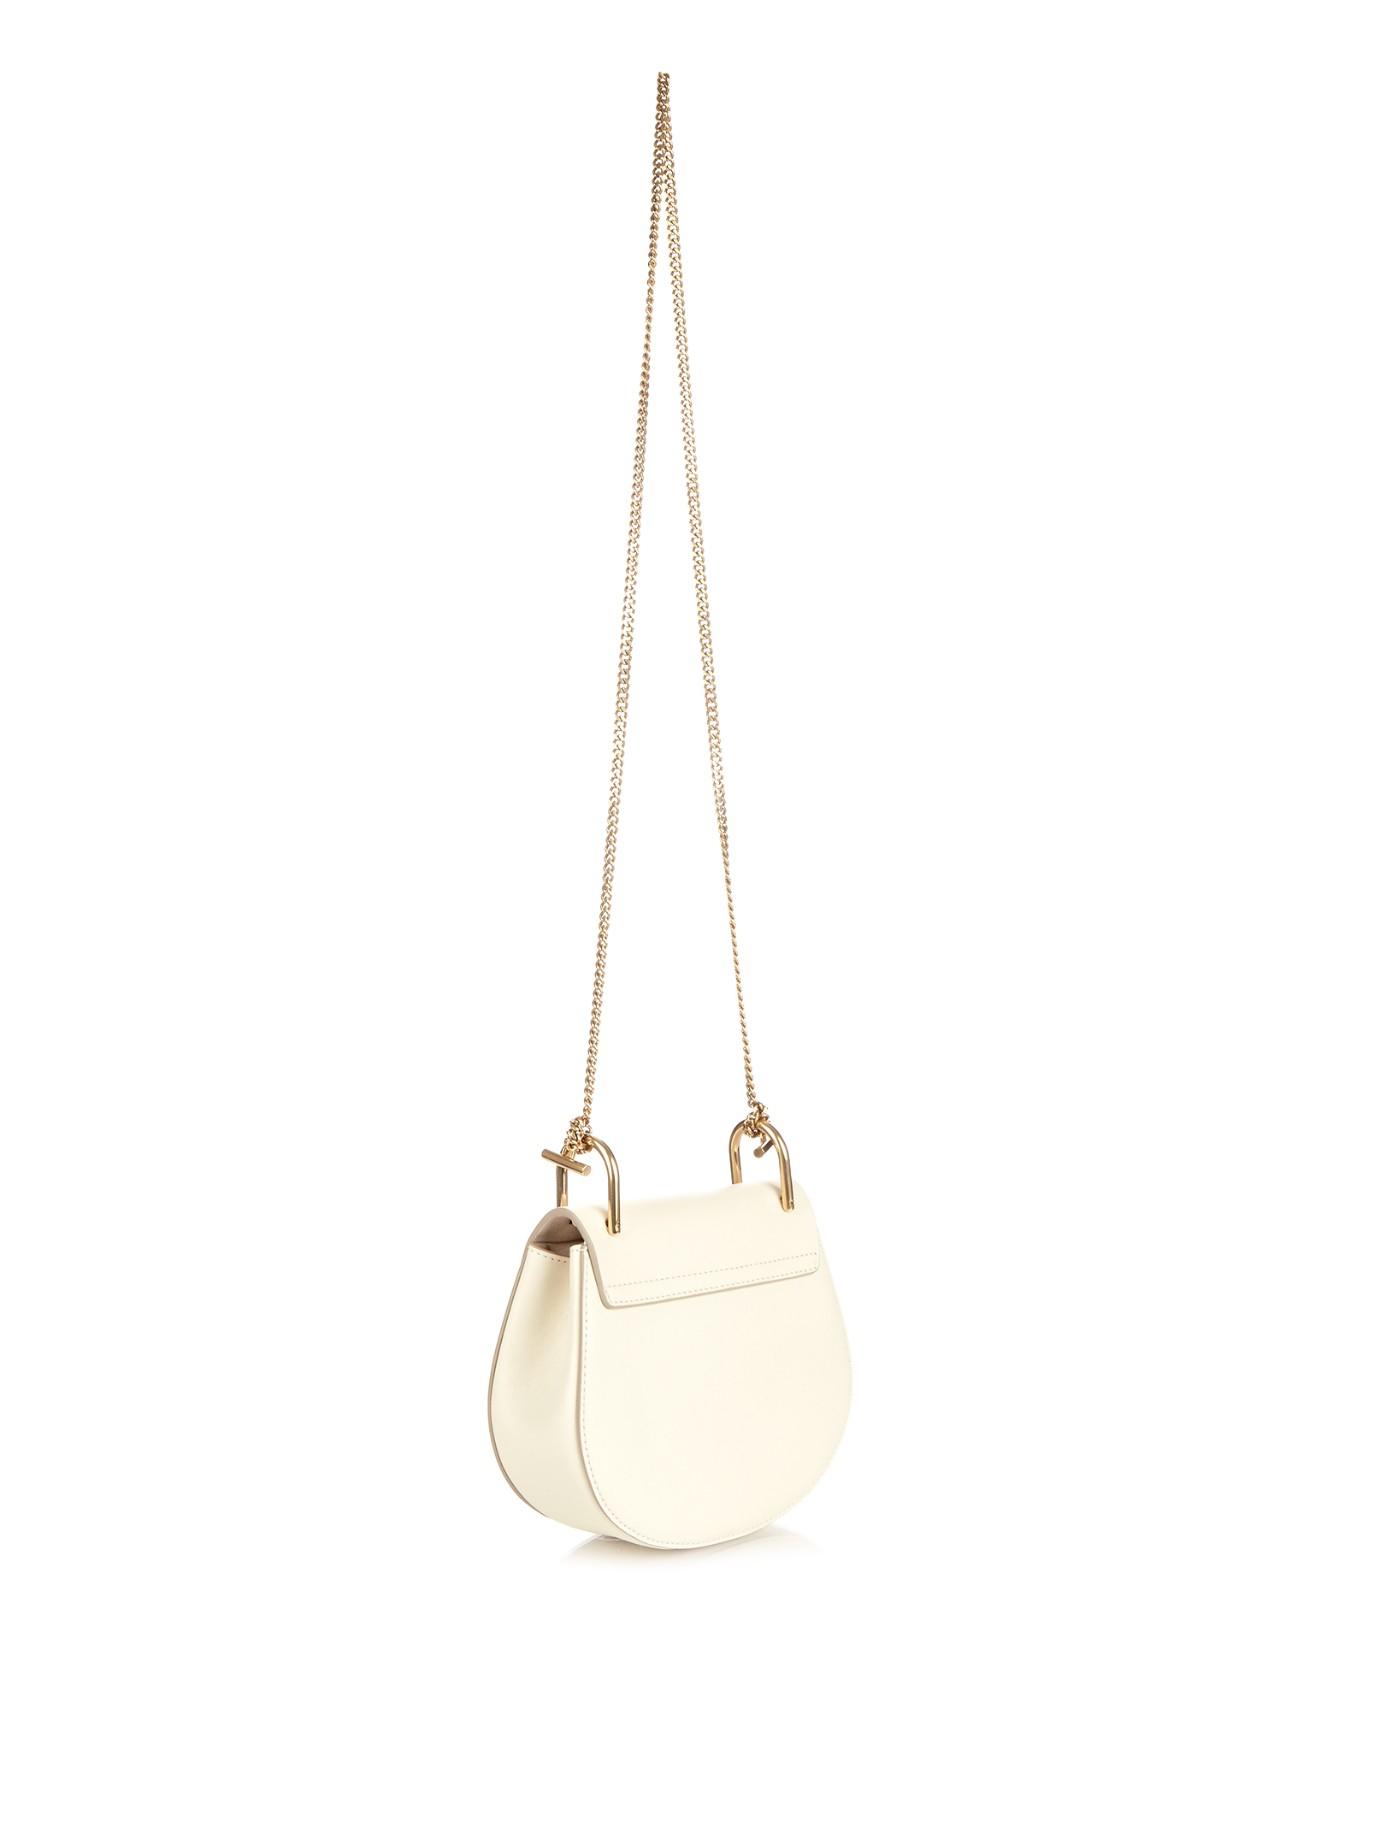 replica chloe bag - Chlo�� Drew Mini Leather Cross-body Bag in White | Lyst